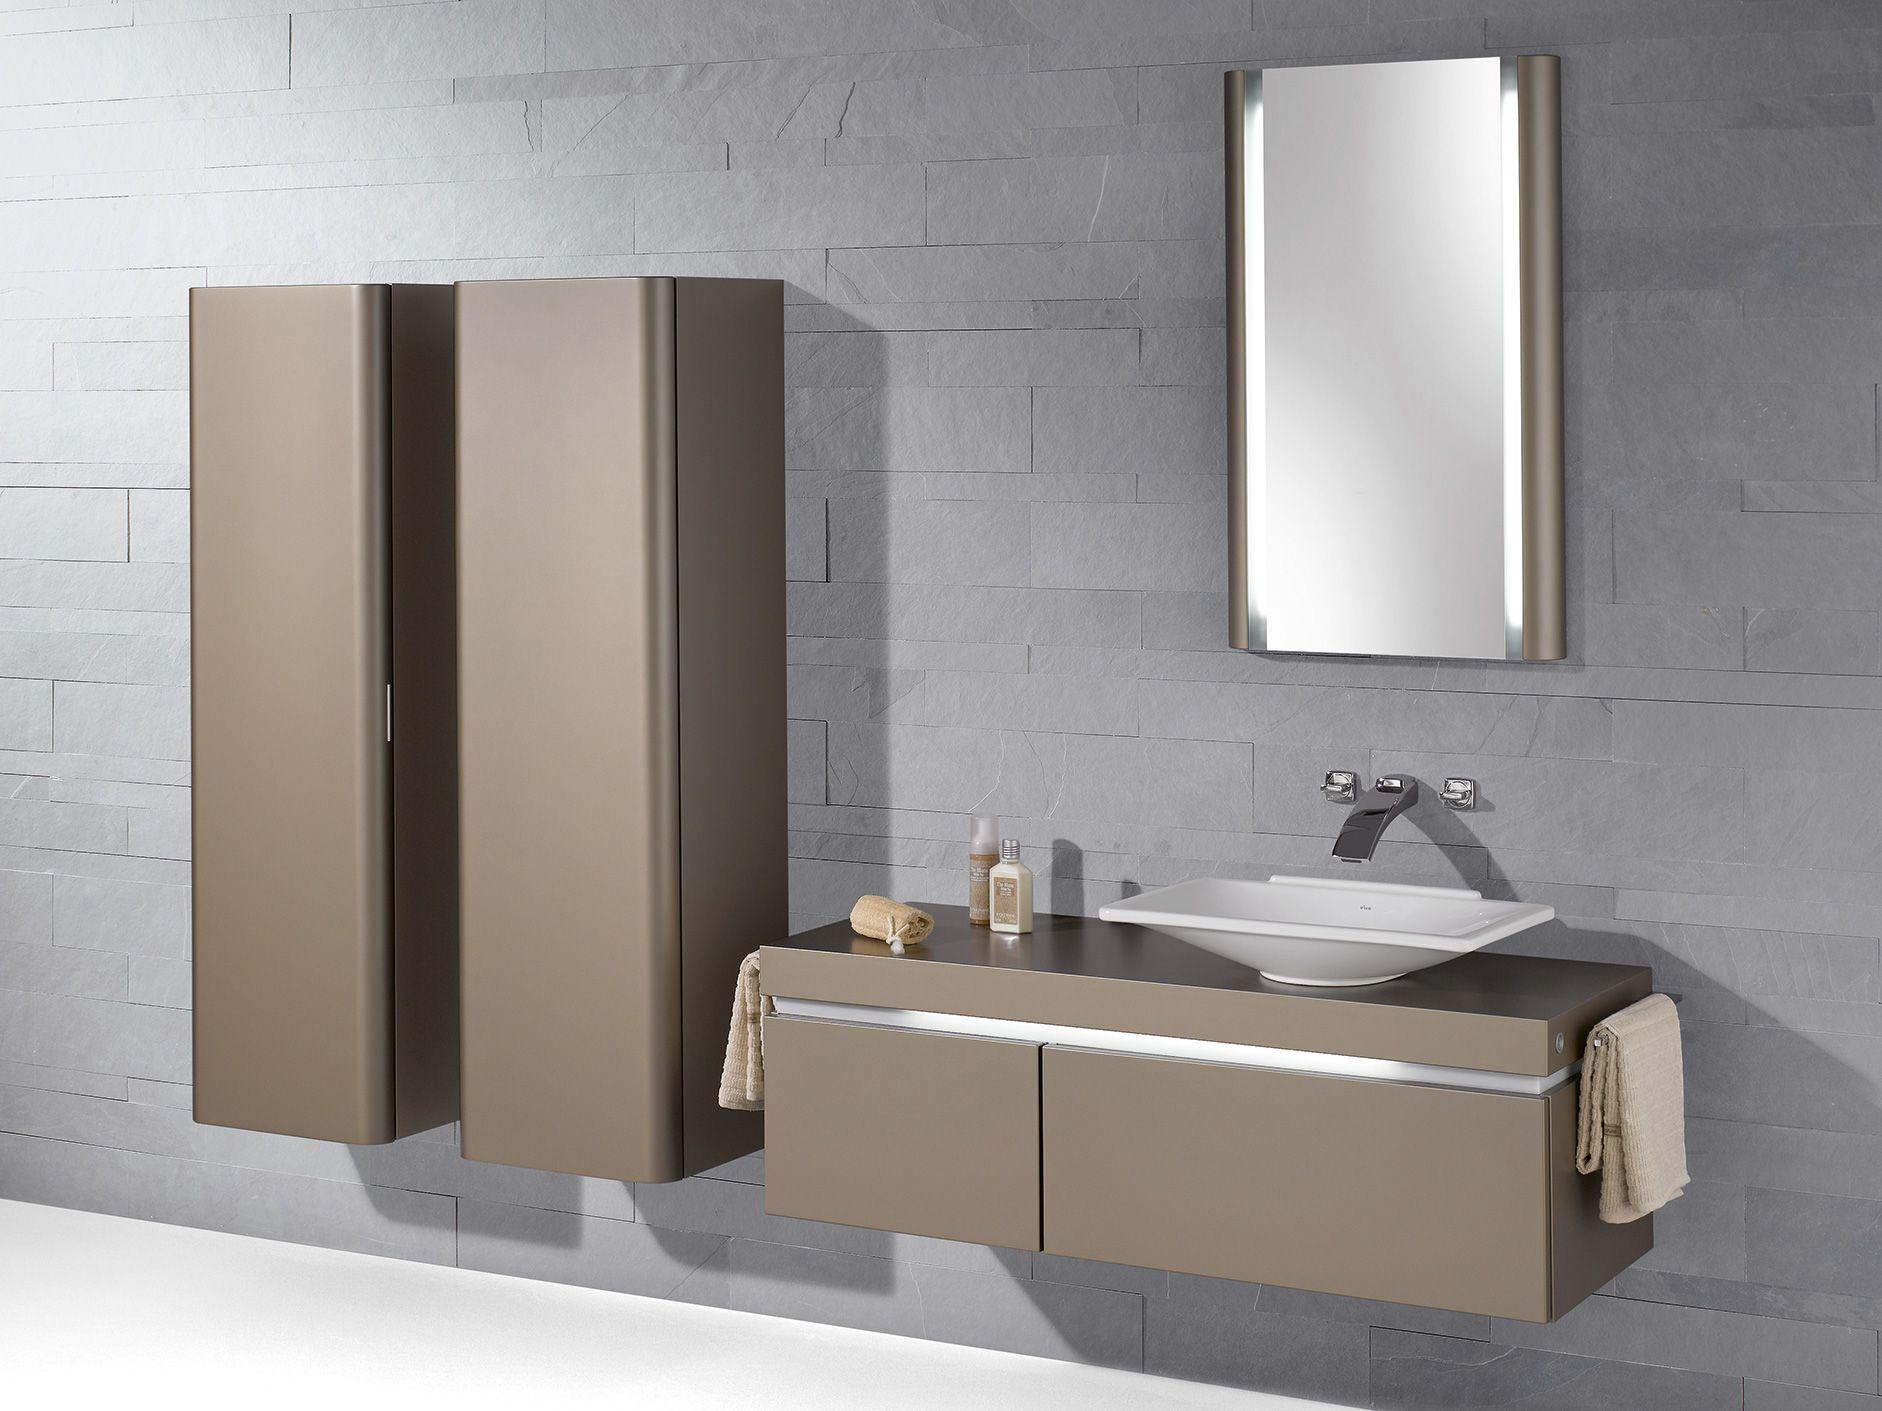 Billige badezimmermöbel ~ Vigour badmöbel badmöbel pinterest badmoebel